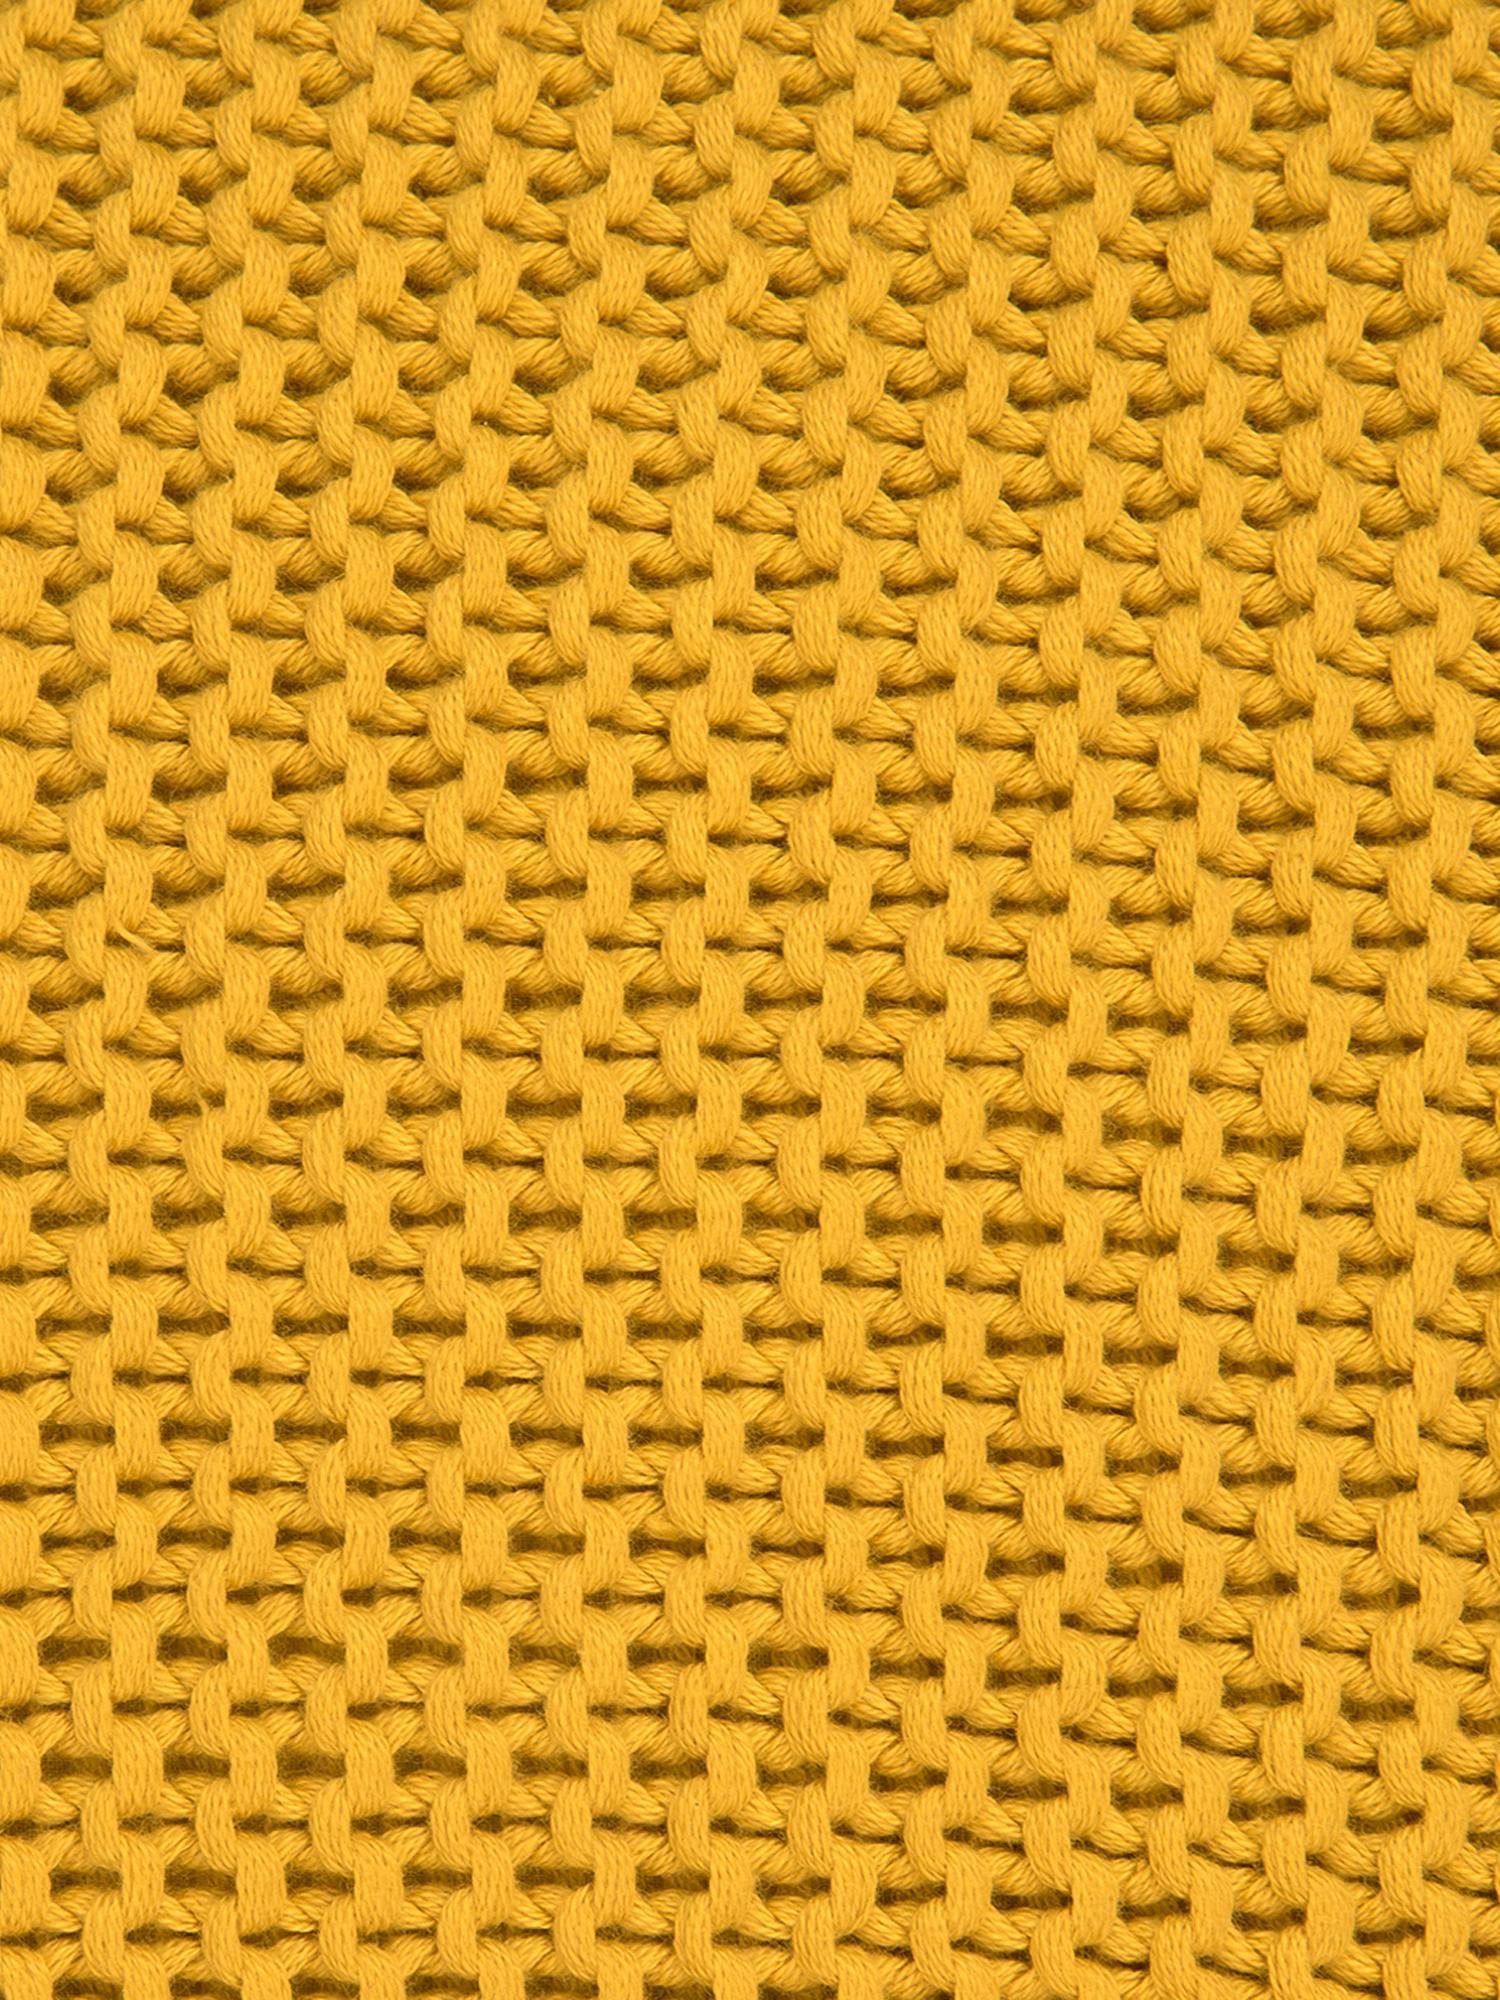 Strick-Kissenhülle Adalyn in Ockergelb, 100% Baumwolle, Ockergelb, 40 x 40 cm